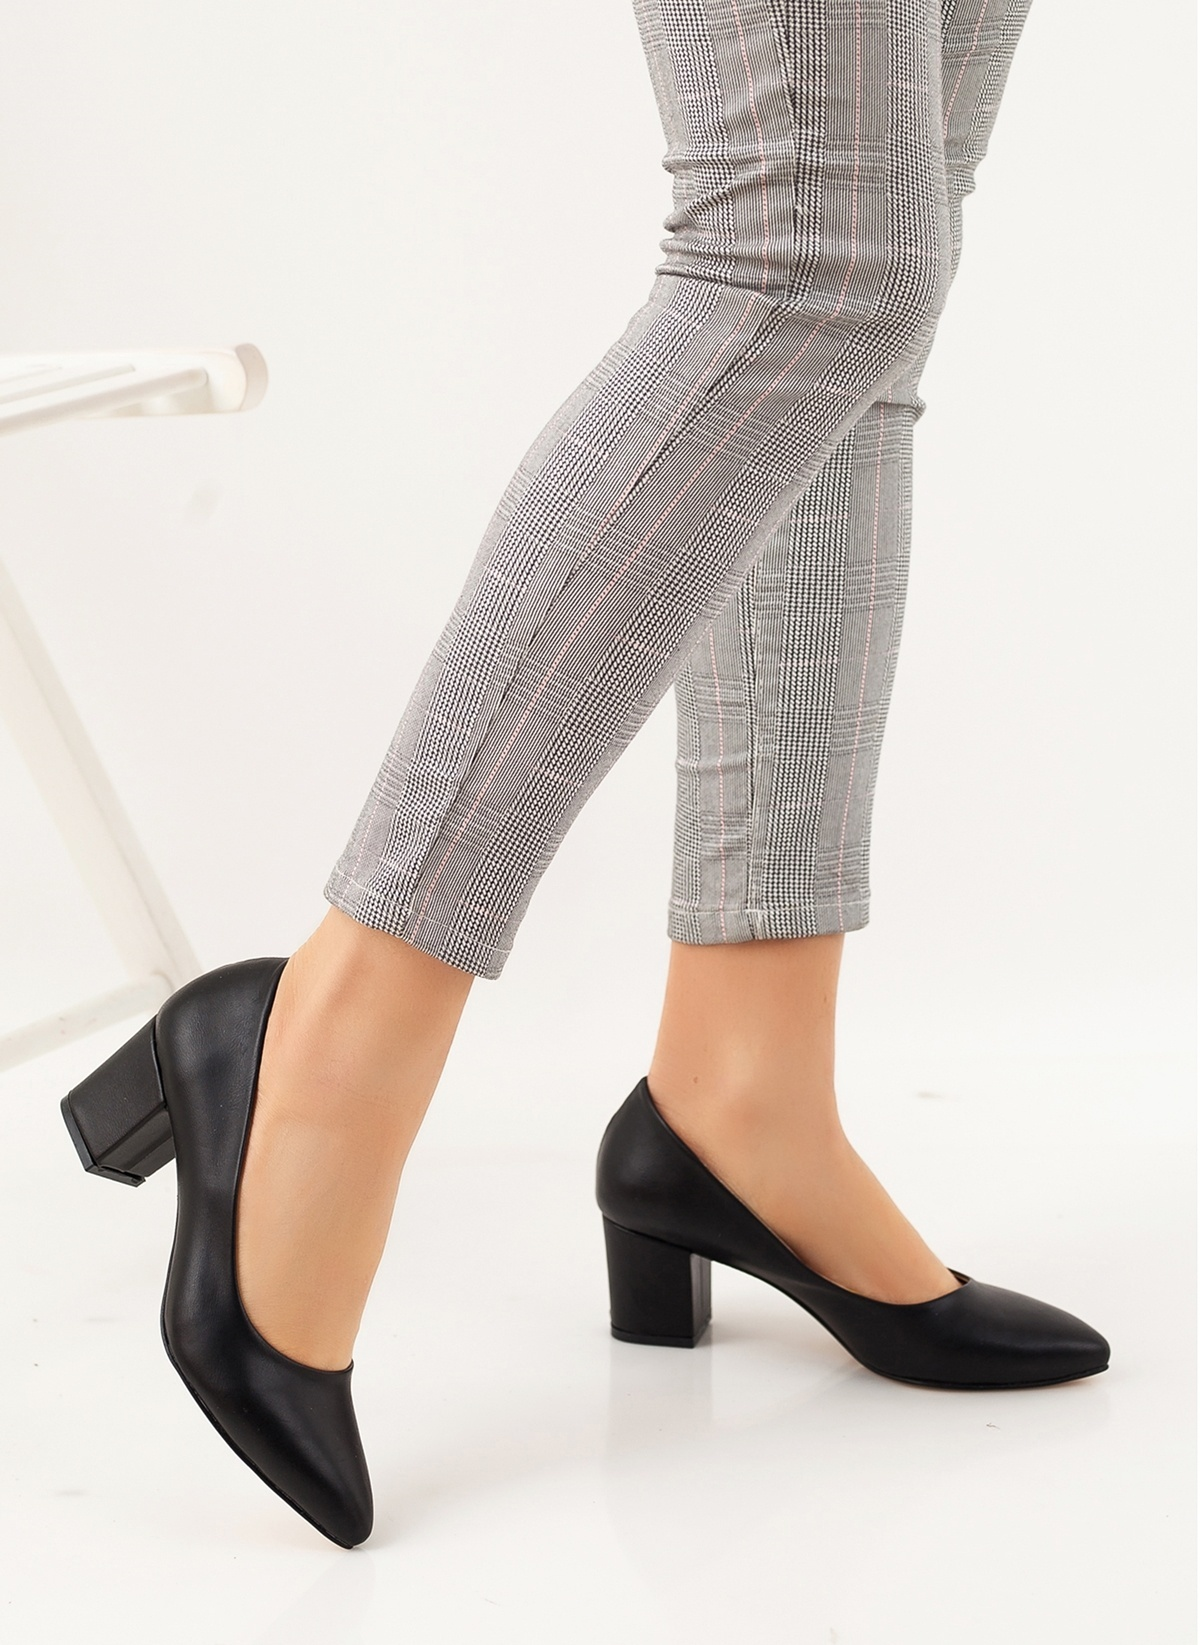 Efem Ayakkabı 19ymd15004 Stiletto – 129.9 TL